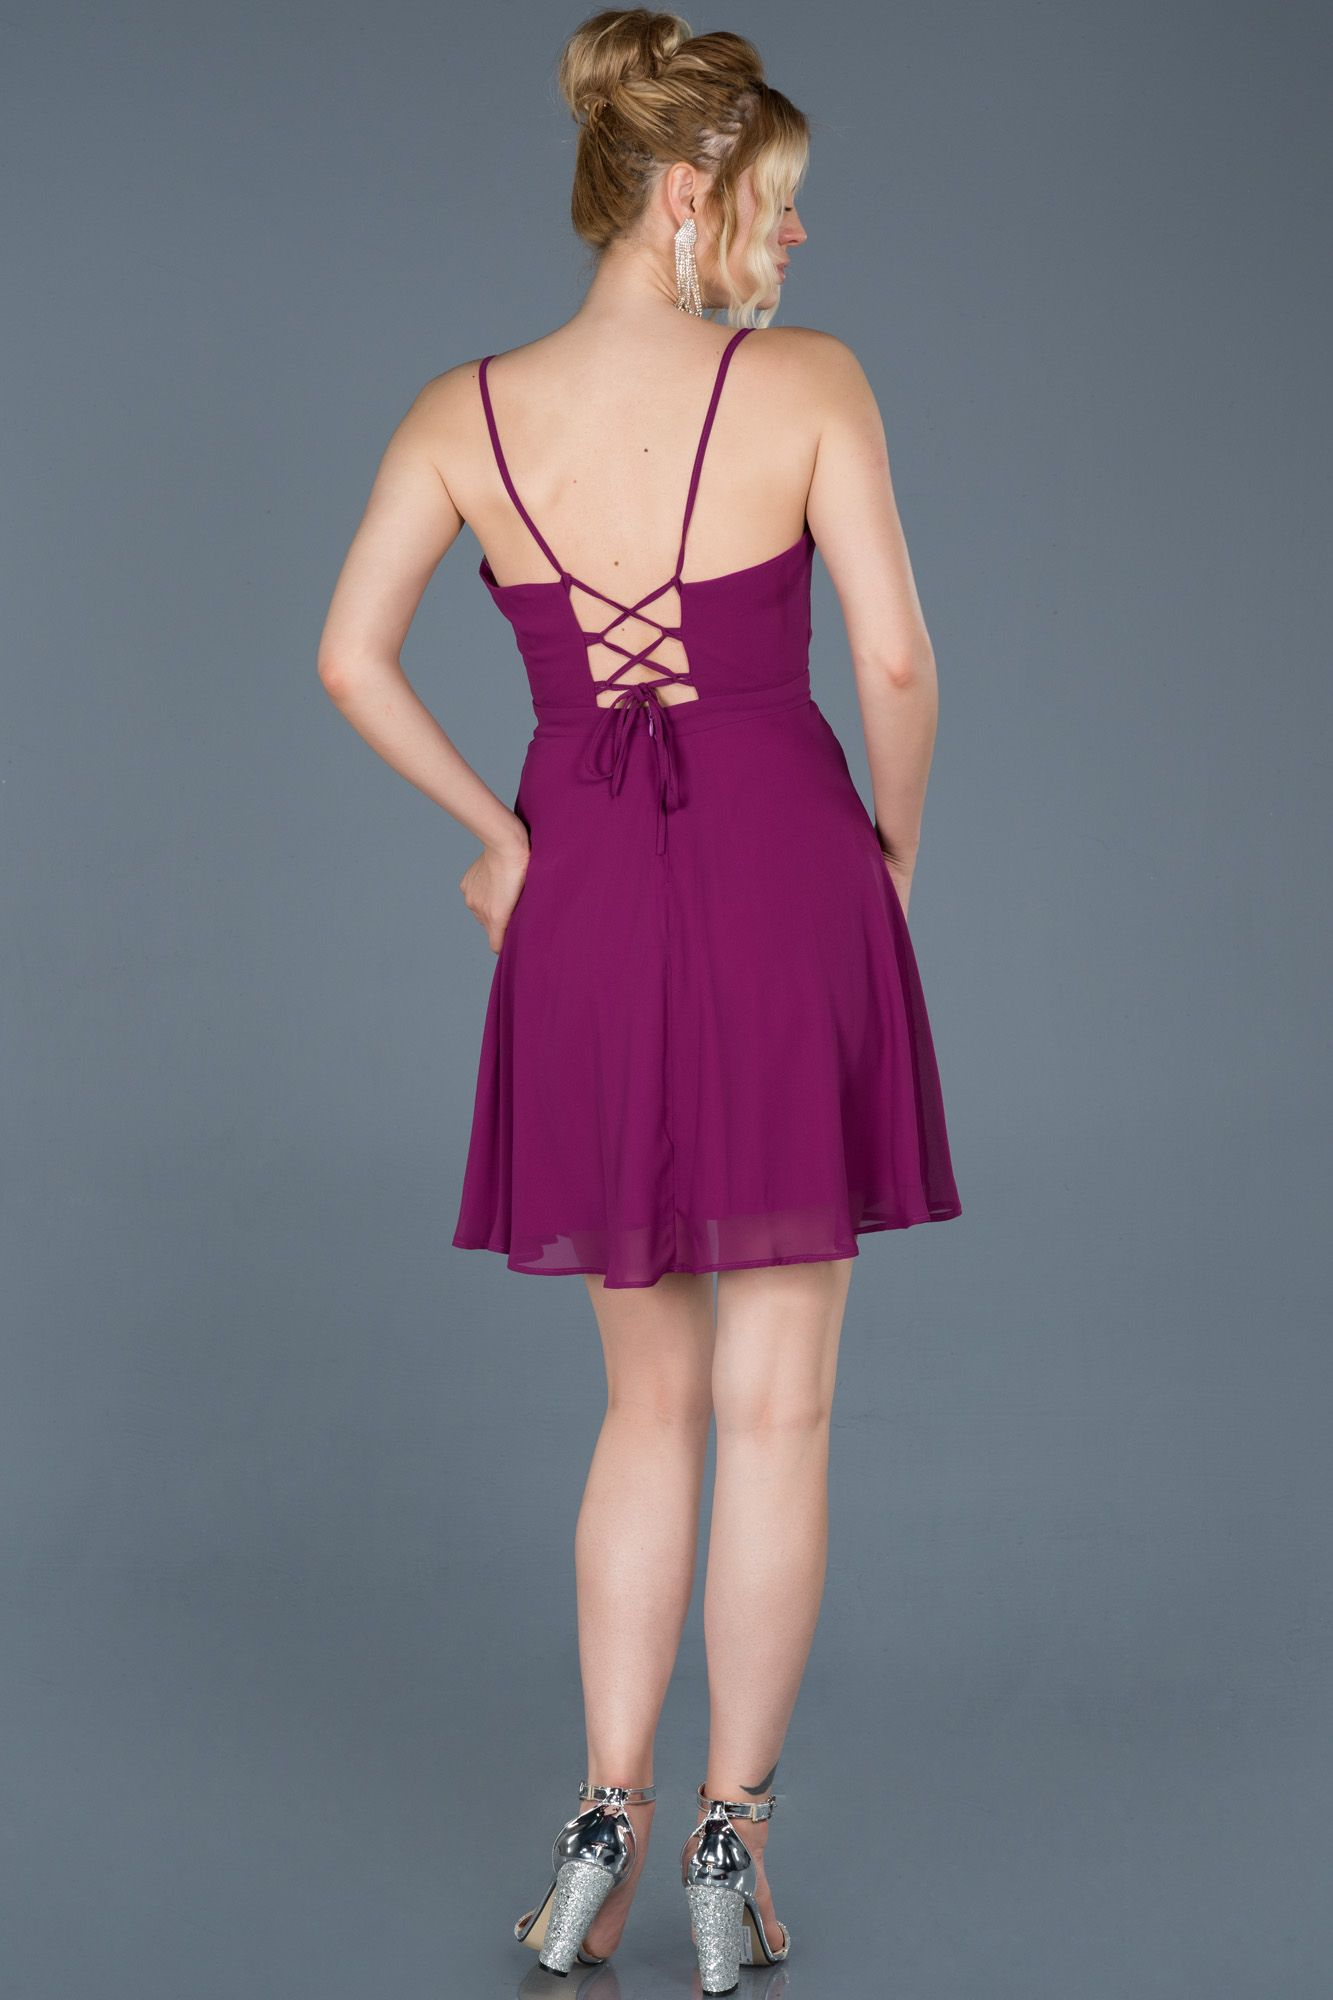 Violet Sirt Dekolteli Sifon Elbise Abk001 2020 Sifon Elbise Moda Stilleri Elbise